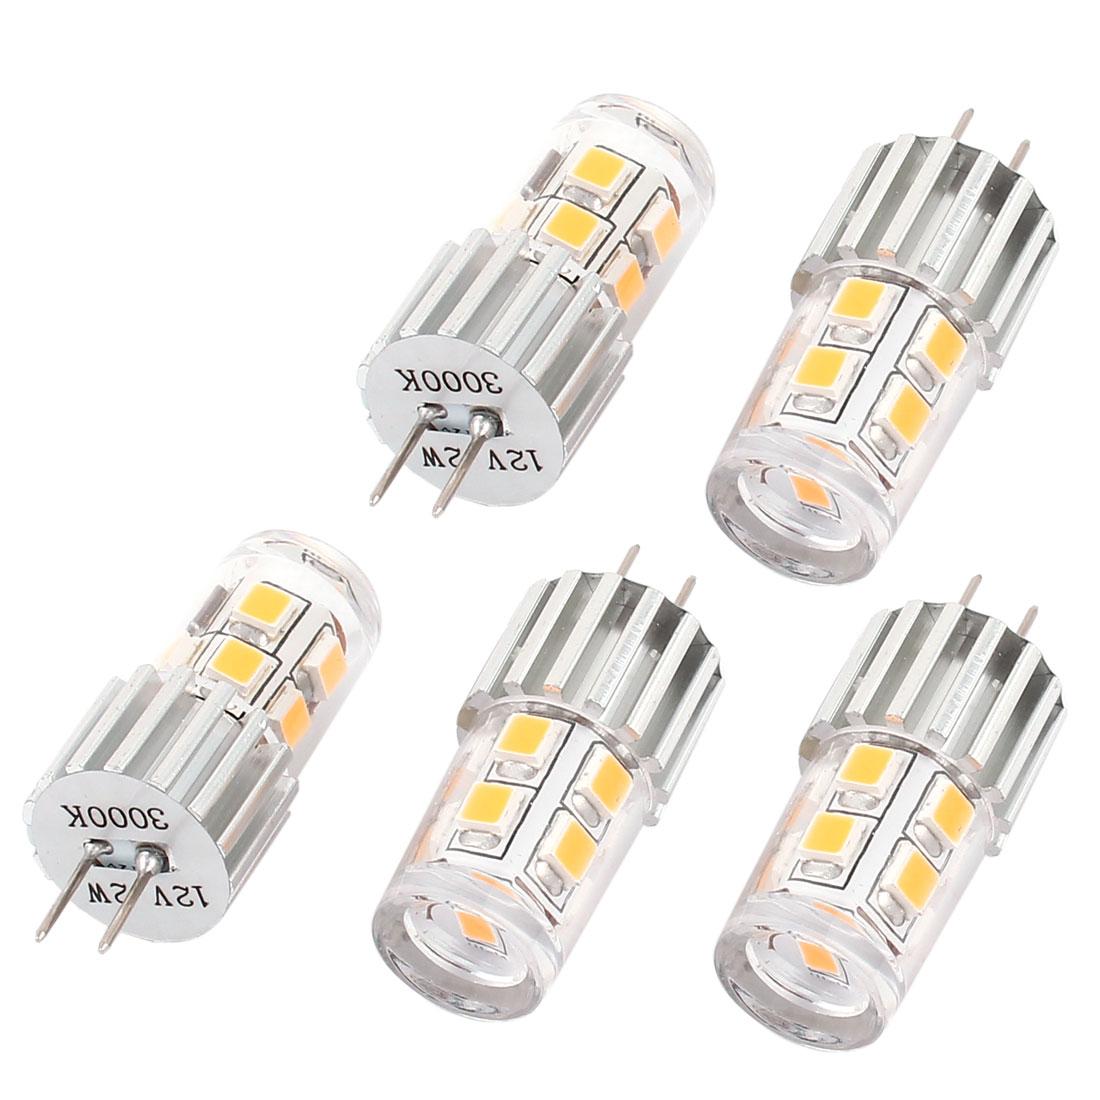 5pcs 180LM Energy Saving G4 Base 2W 2835 SMD 12 LED Bulb Corn Light Warm White